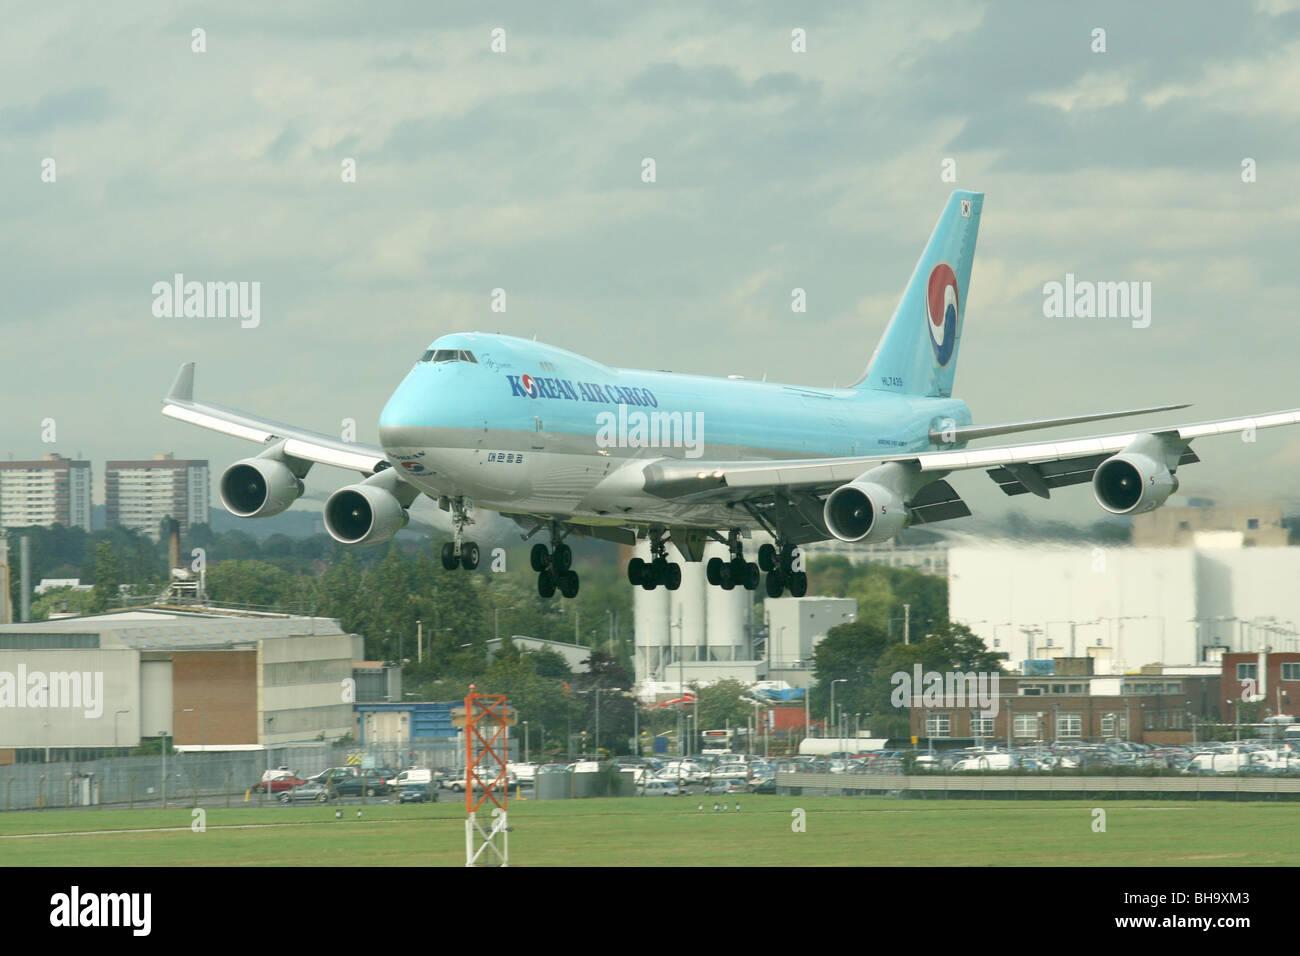 Korean Air Cargo 747, Jumbo jet, landing at Heathrow airport. - Stock Image